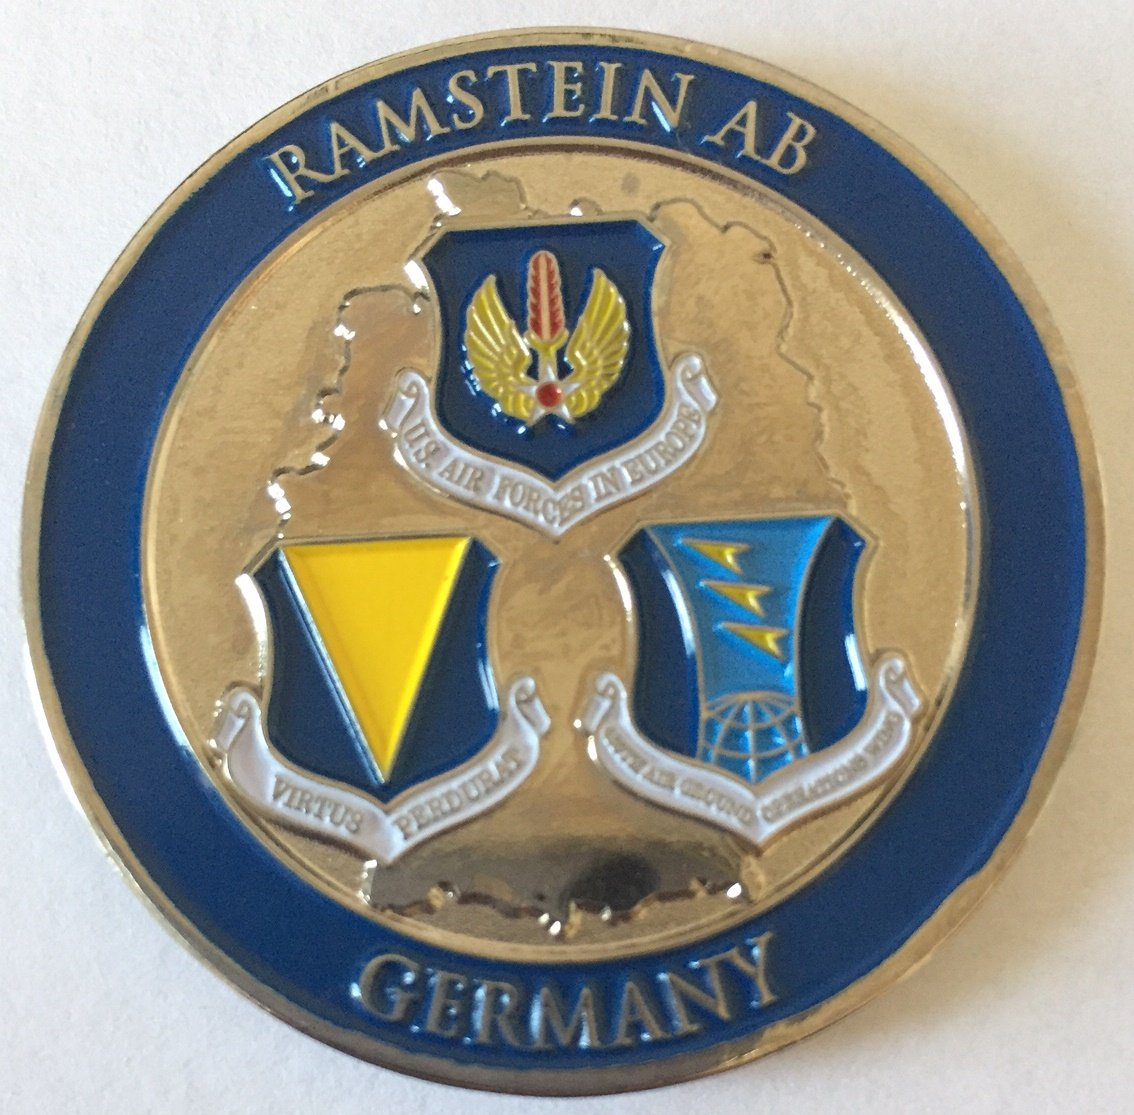 Ramstein Air Base Challenge Coin B01LYFKJRZ